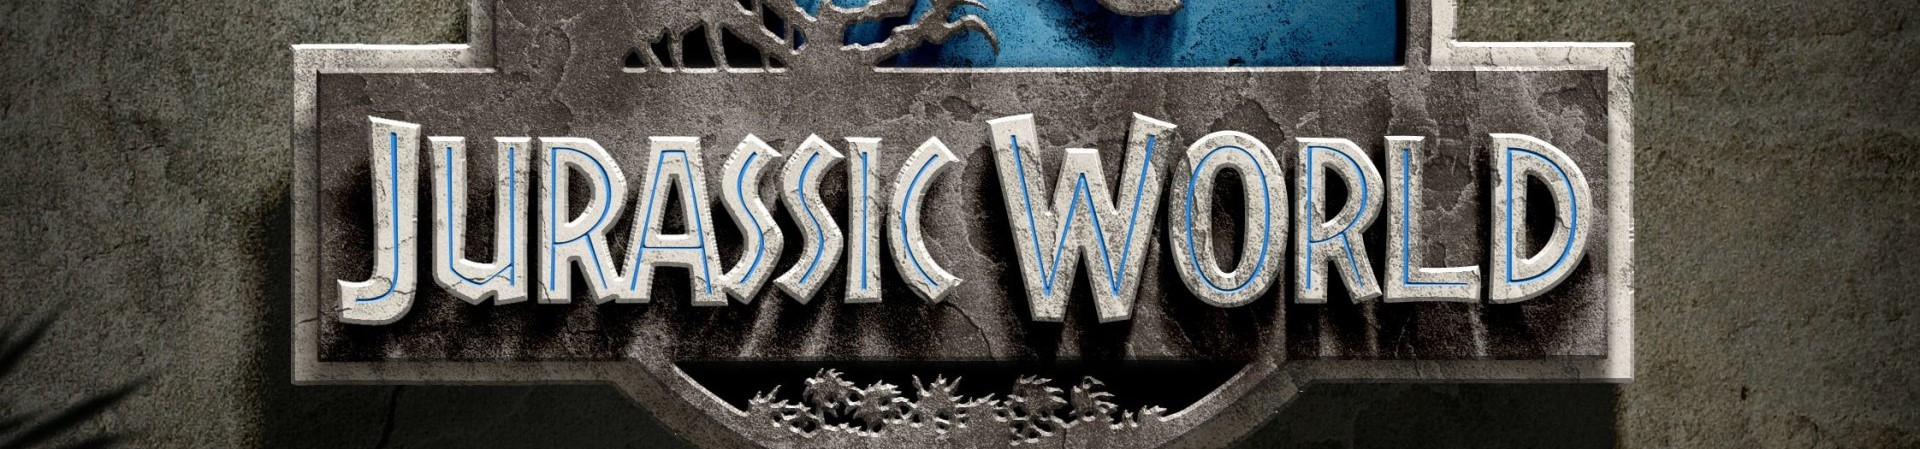 Jurassic World Recension GGG- (inkl video)